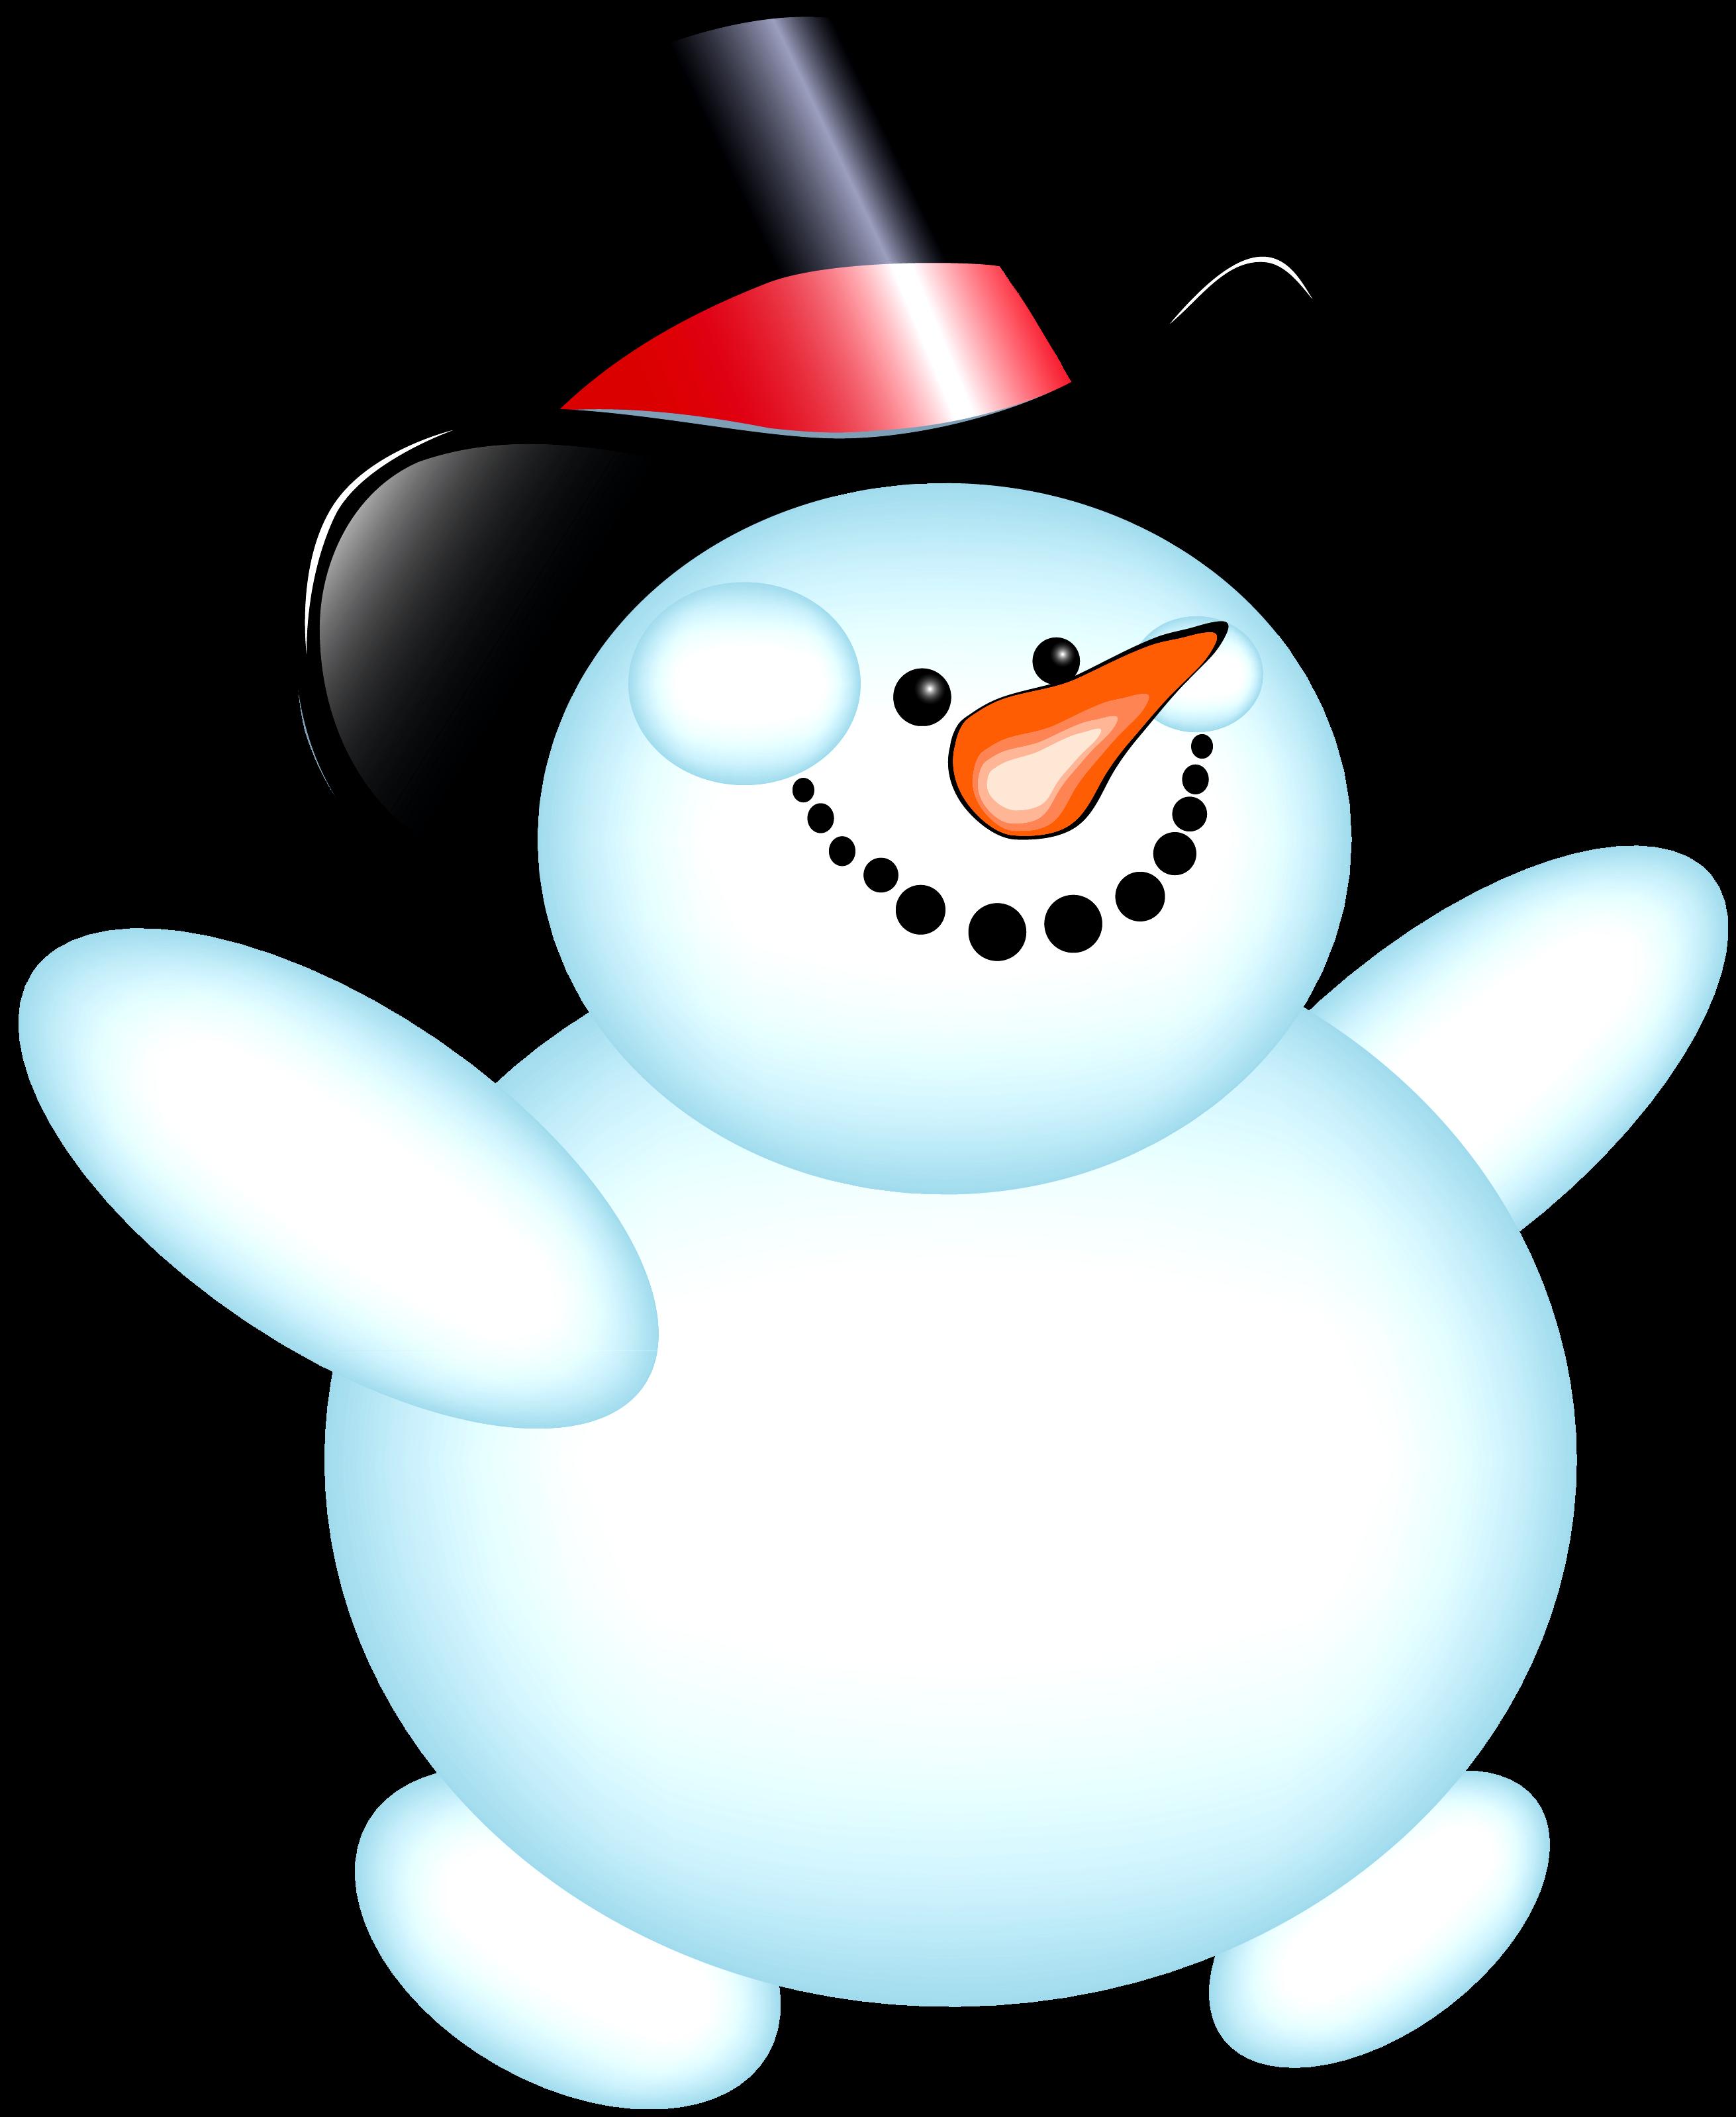 ideas christmas large. Clipart tree cupcake